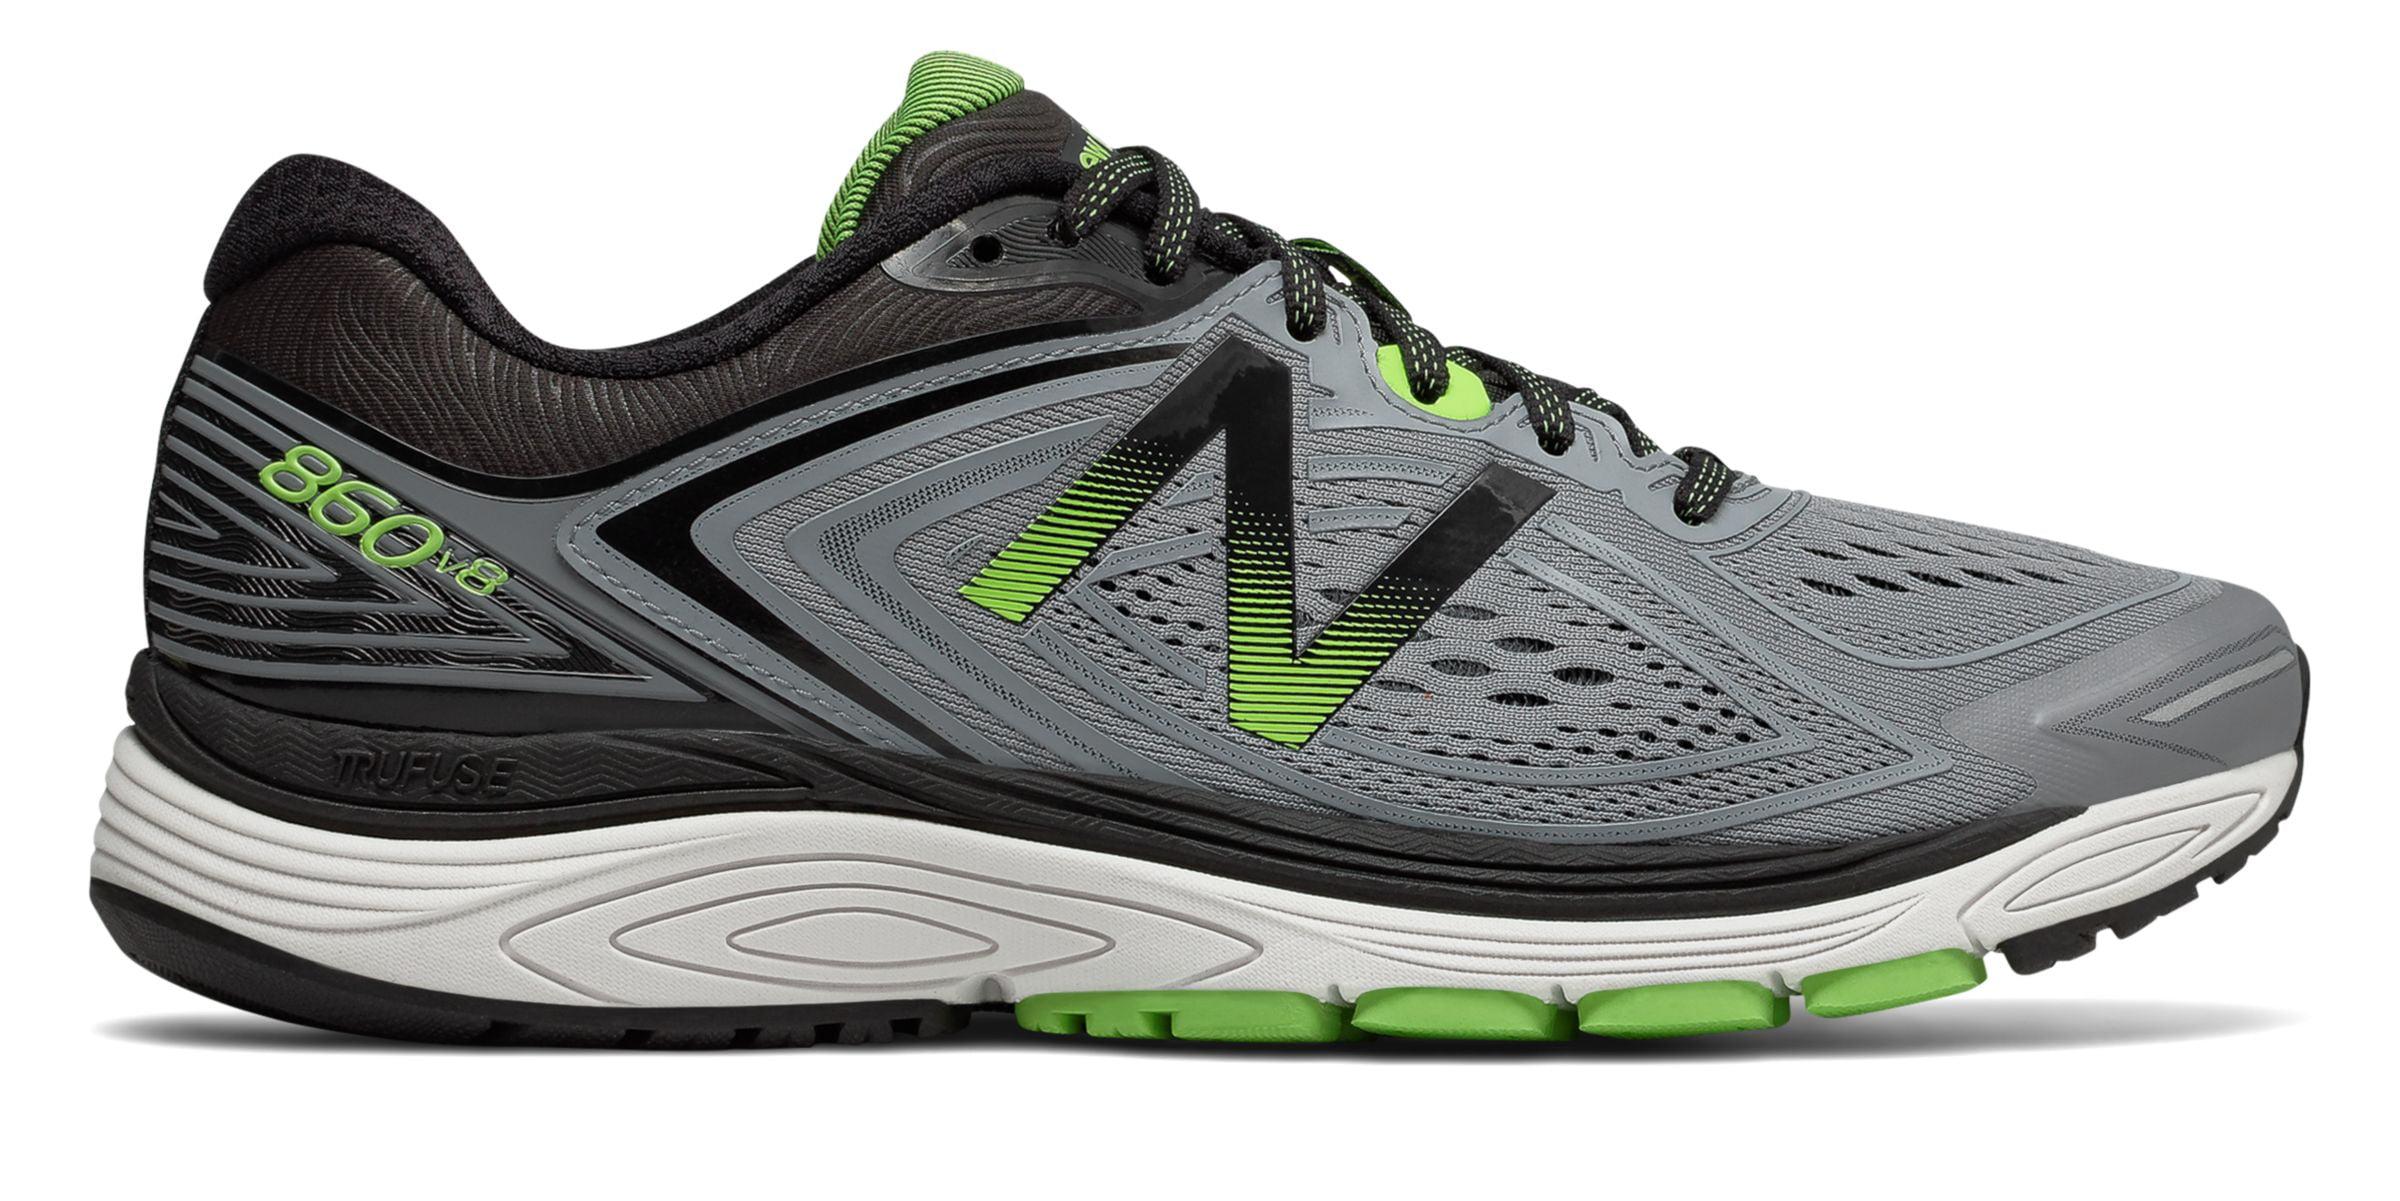 New Balance Men's 860v8 Shoes Grey